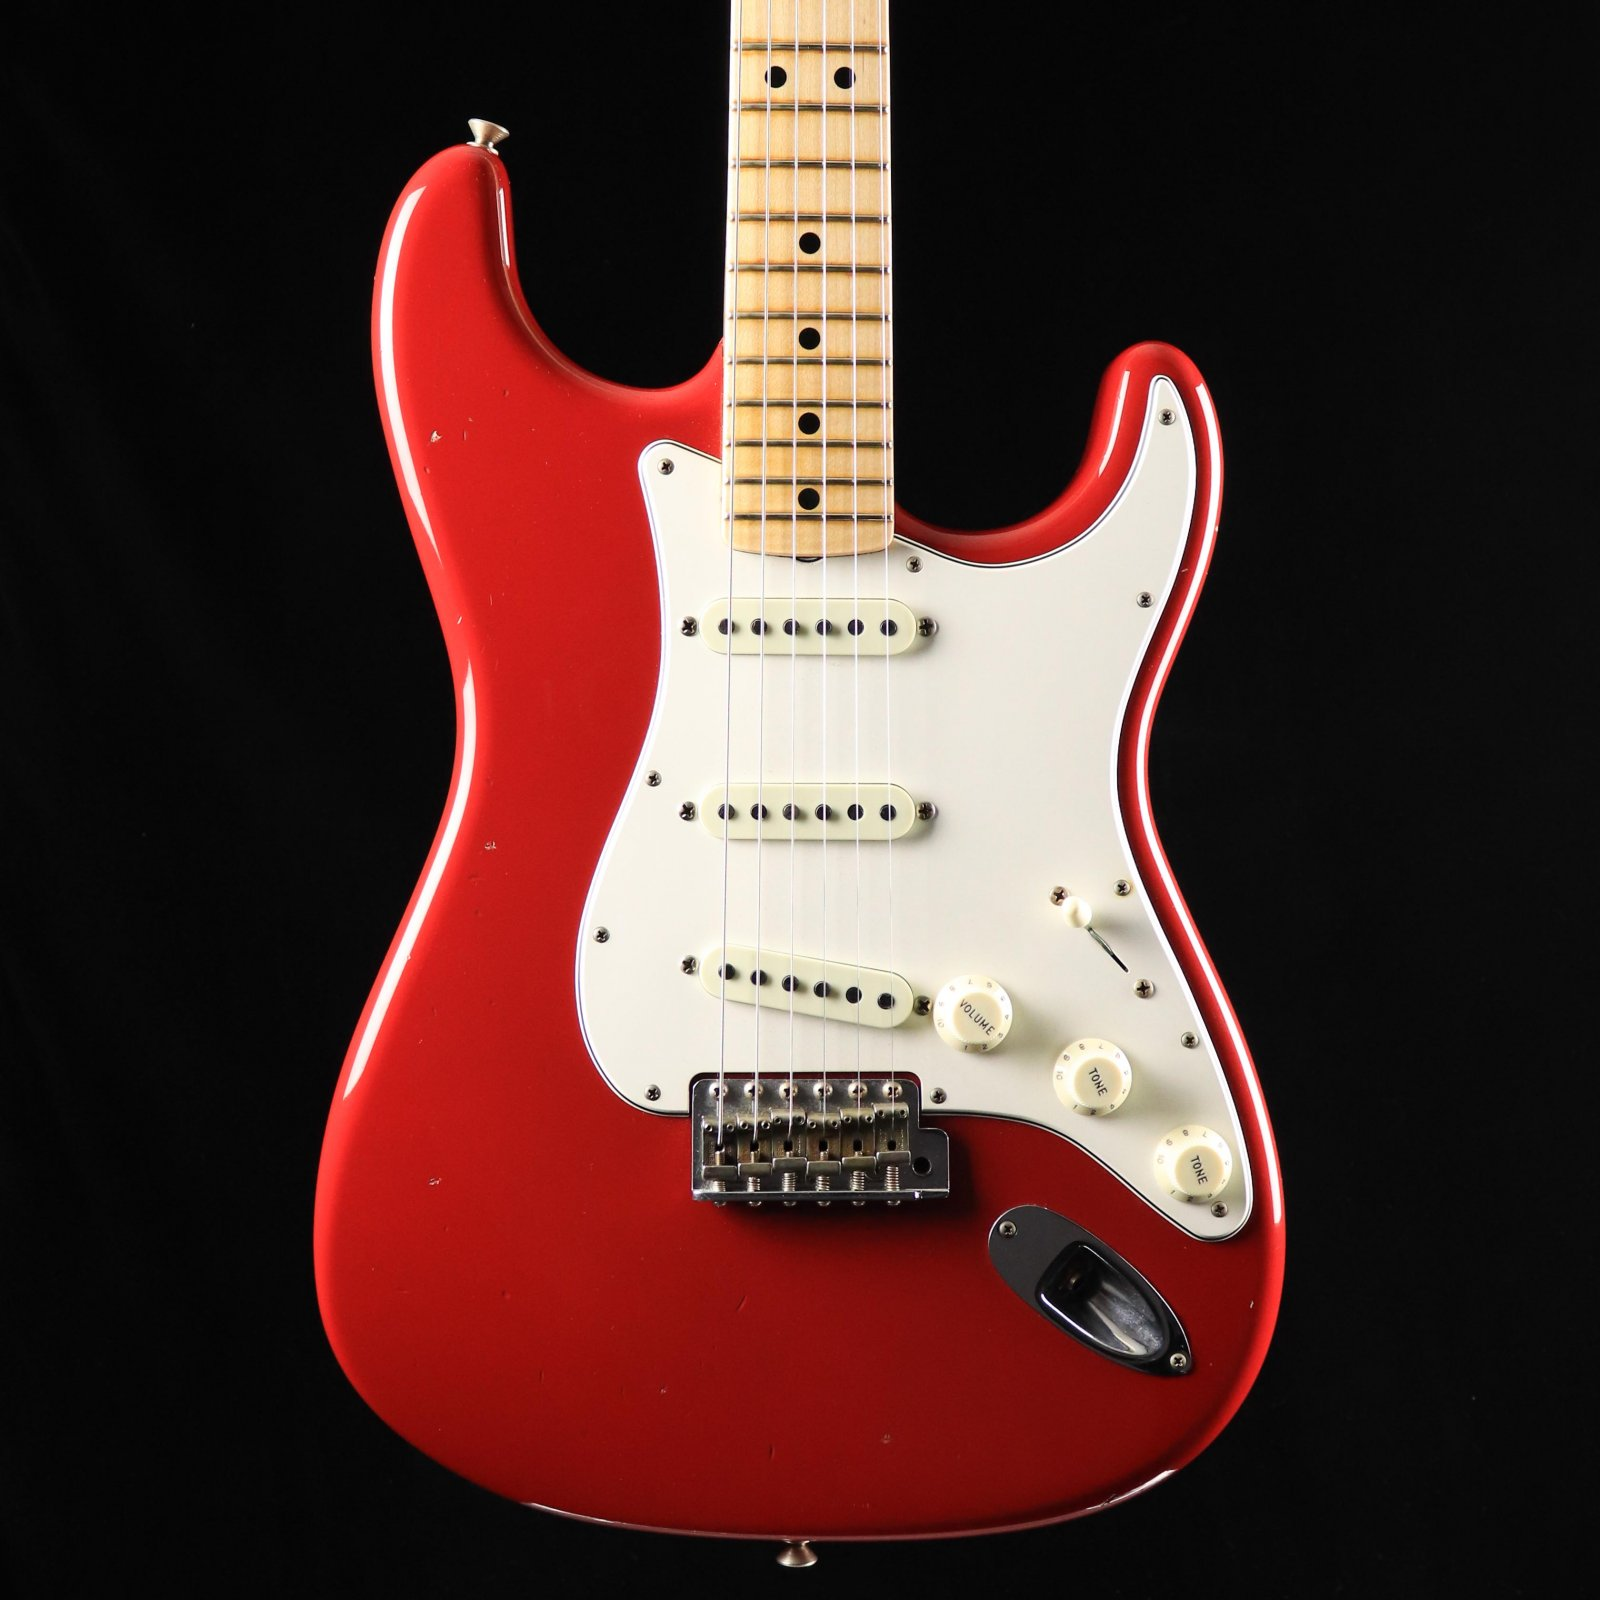 Fender Custom Shop 1969 Stratocaster Journeyman - Aged Dakota Red